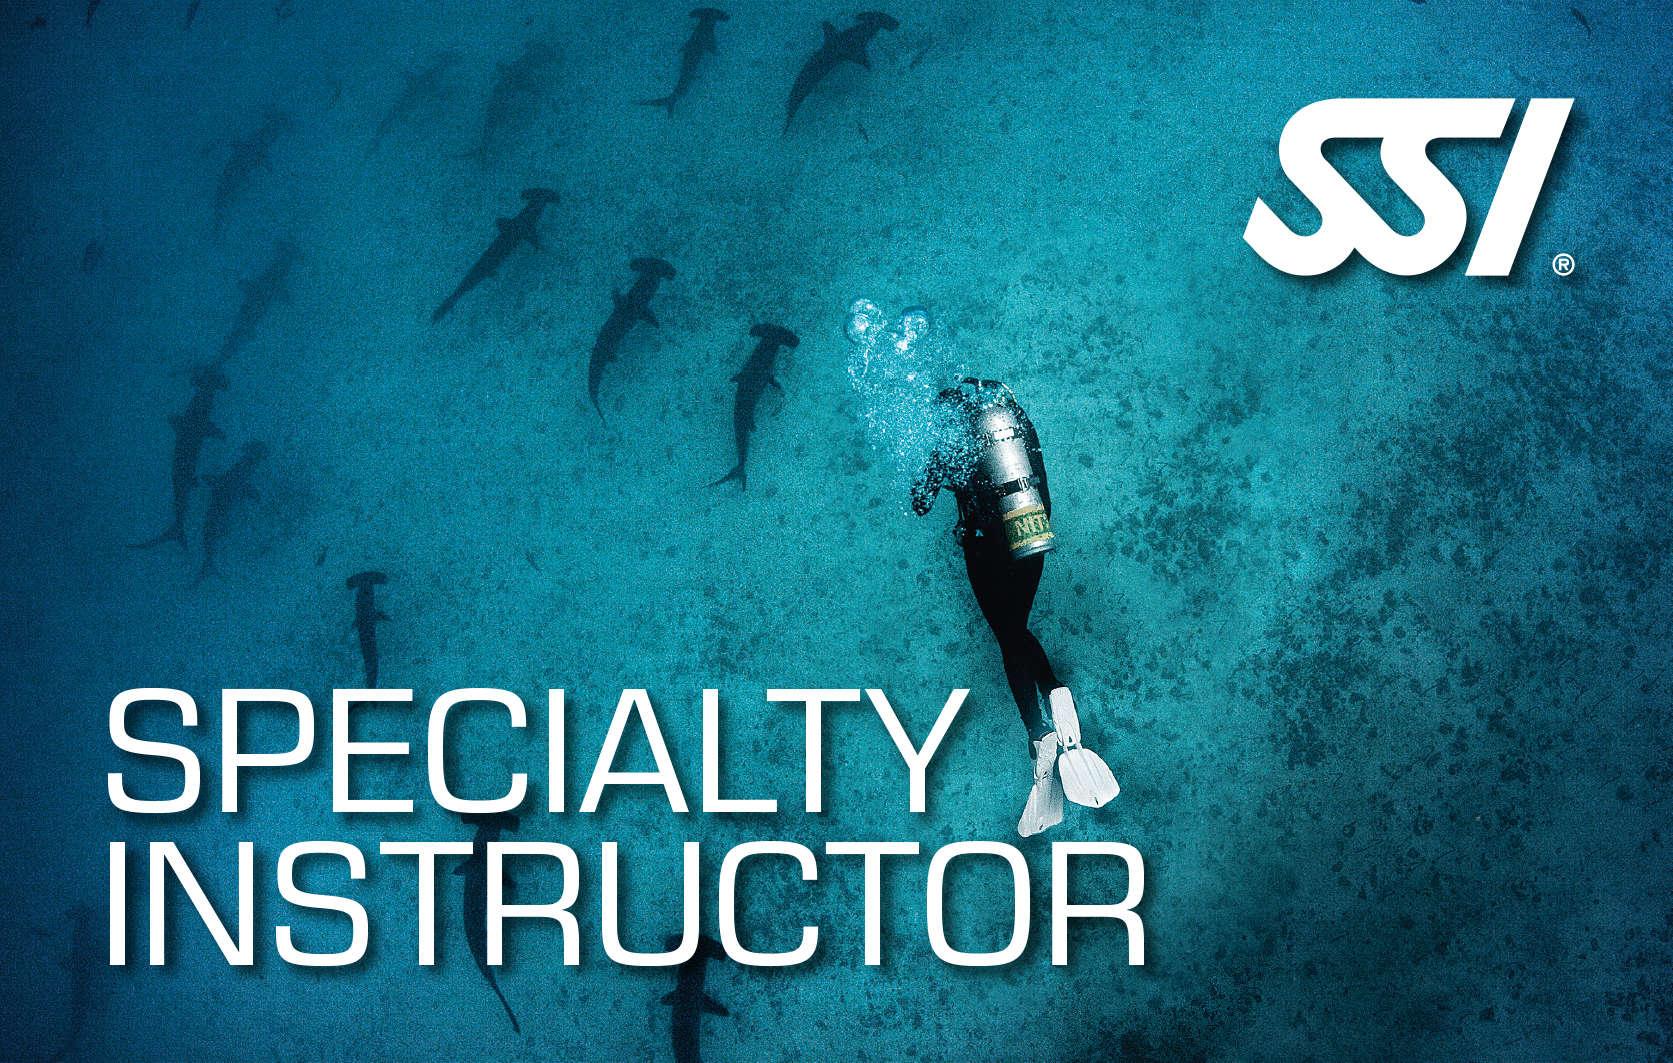 Specialty-Instructor-koh-phangan